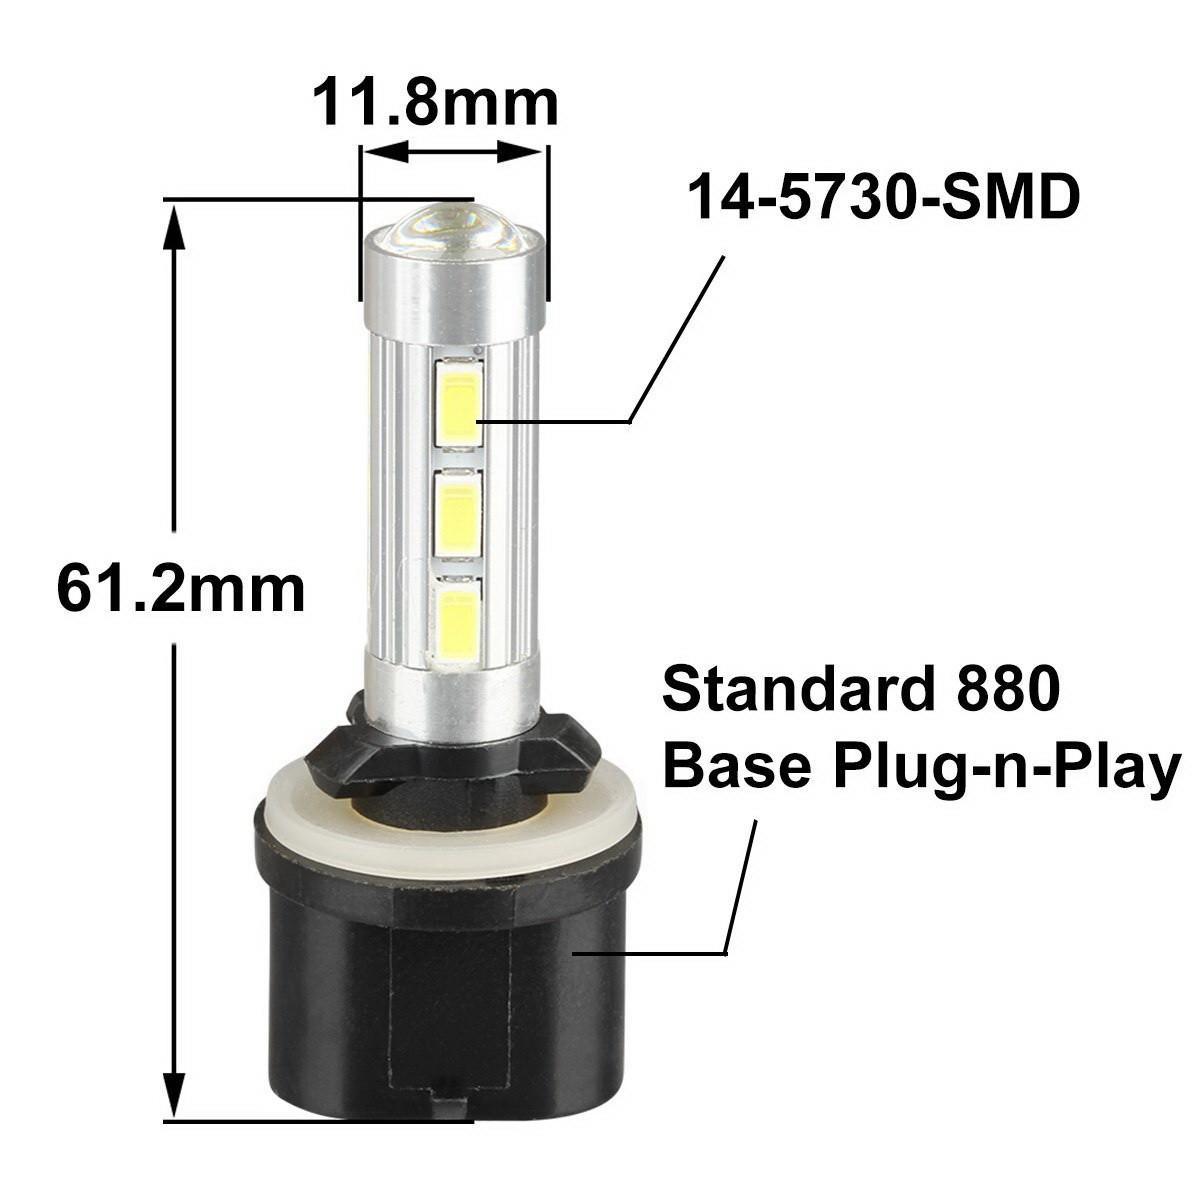 2005 2009 ford mustang 2x hid white 921 led reverse light bulb backup - 2x White 880 892 893 899 High Power